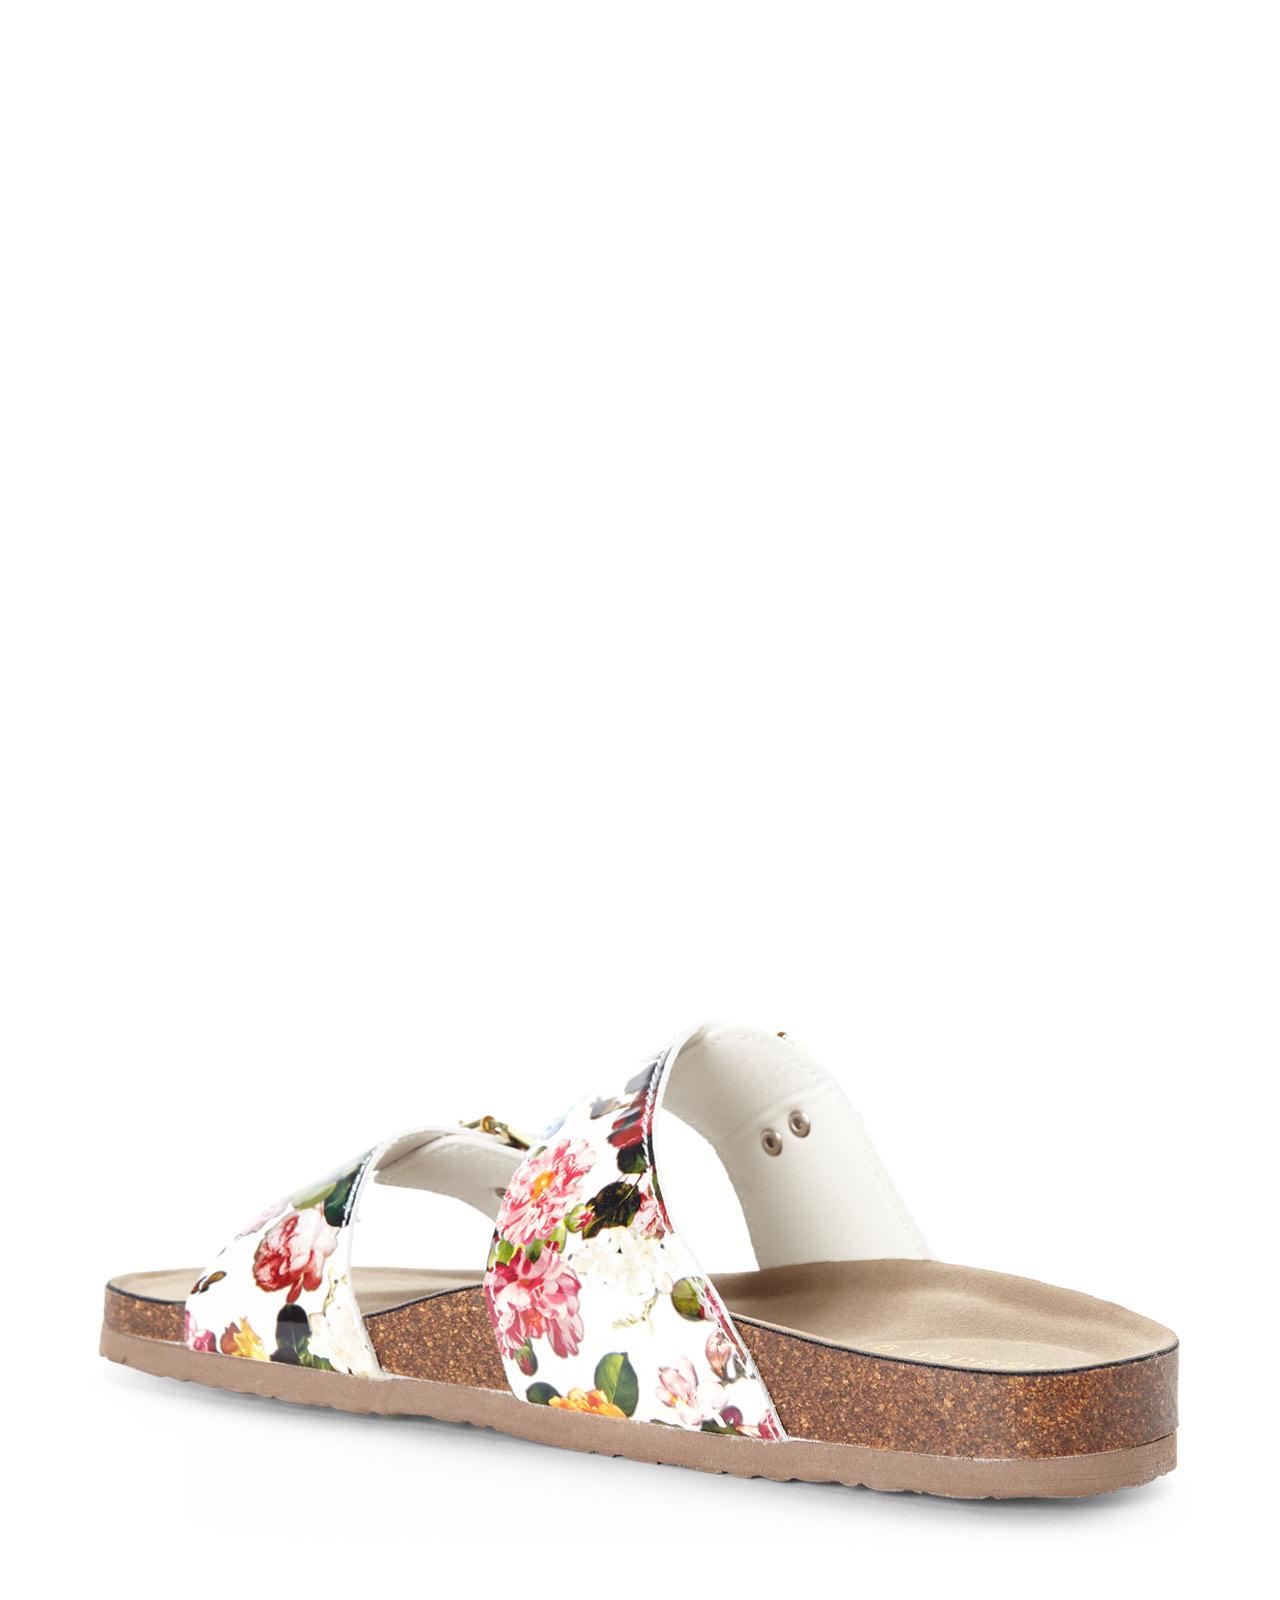 b3a2497f7b9fa Lyst - Madden Girl White Floral Brando Sandals in White